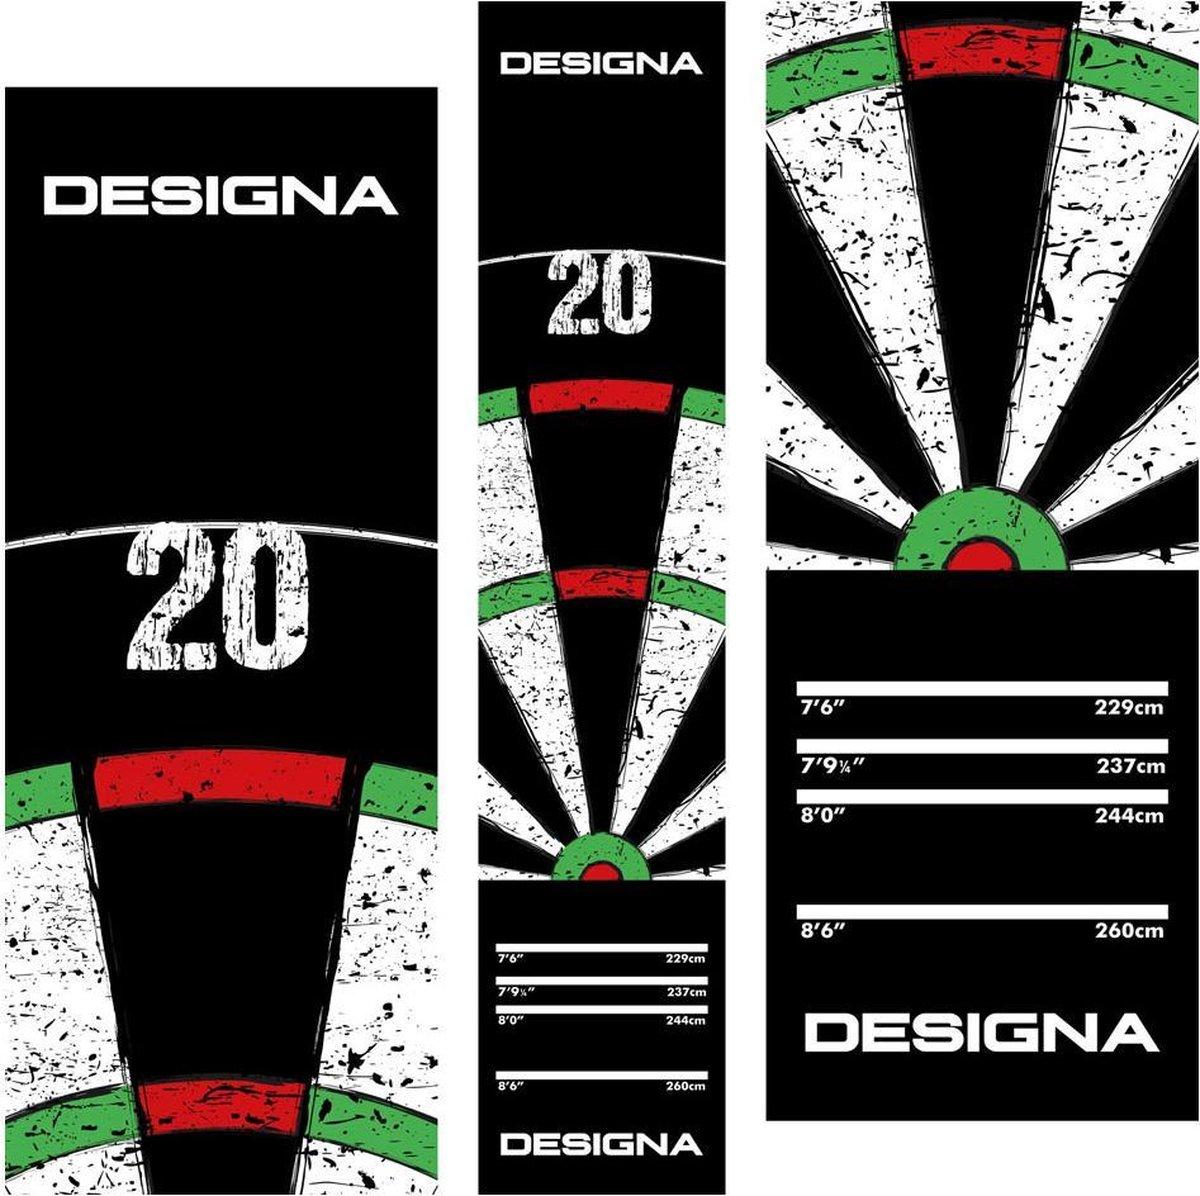 Designa Dartbord Carpet Mat 290x60